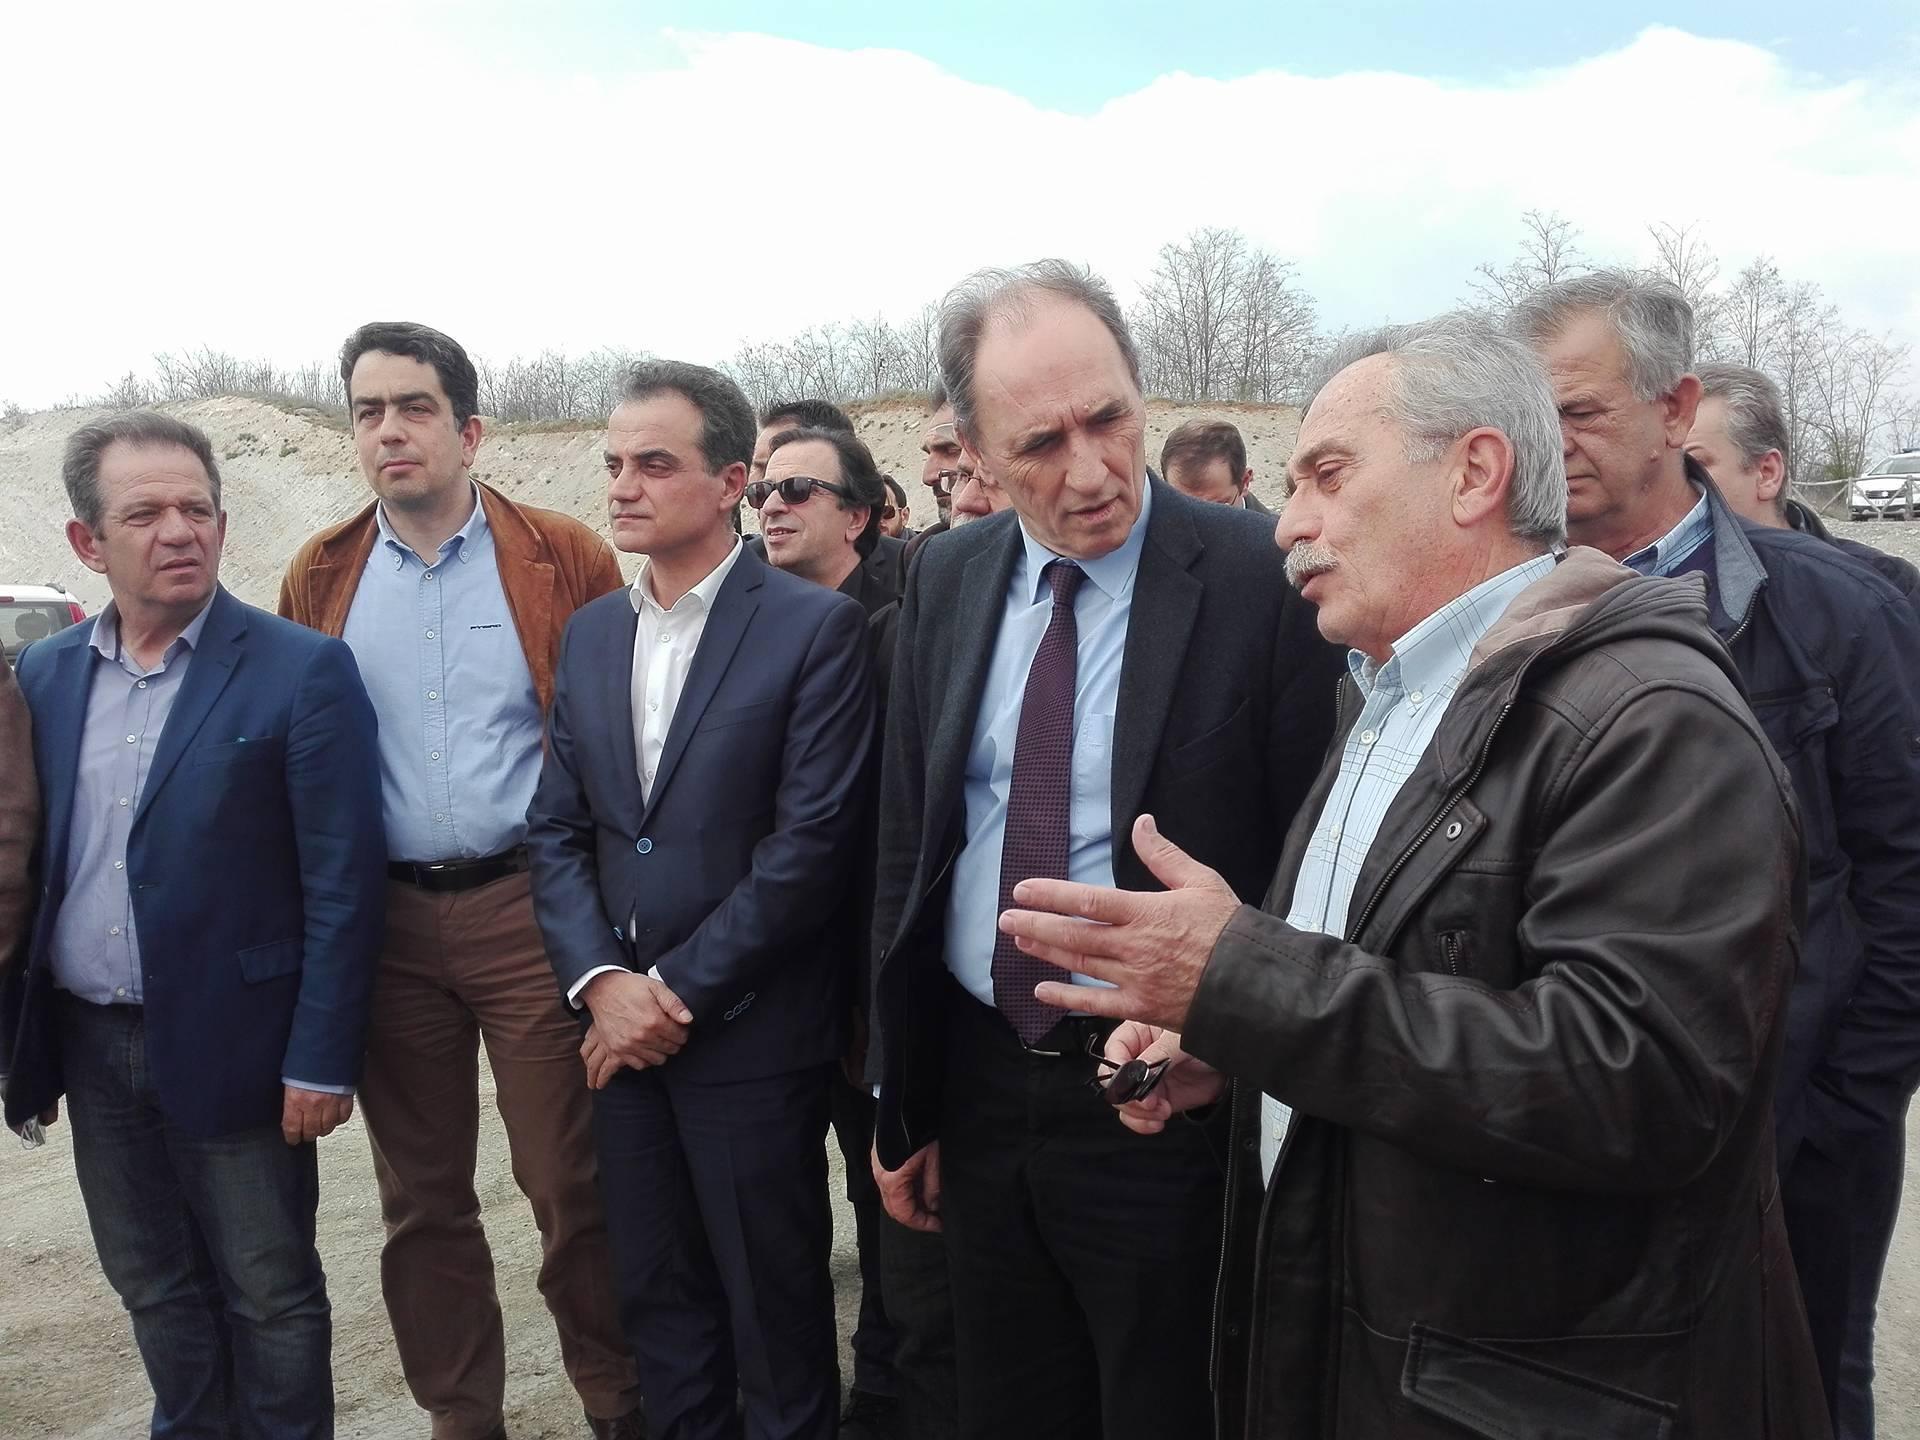 "kozan.gr: Ξενάγηση του Υπουργού Ενέργειας & Περιβάλλοντος, Γ. Σταθάκη, στην υπό κατασκευή λιγνιτική μονάδα ""Πτολεμαίδα 5"" (Βίντεο & Φωτογραφίες)"